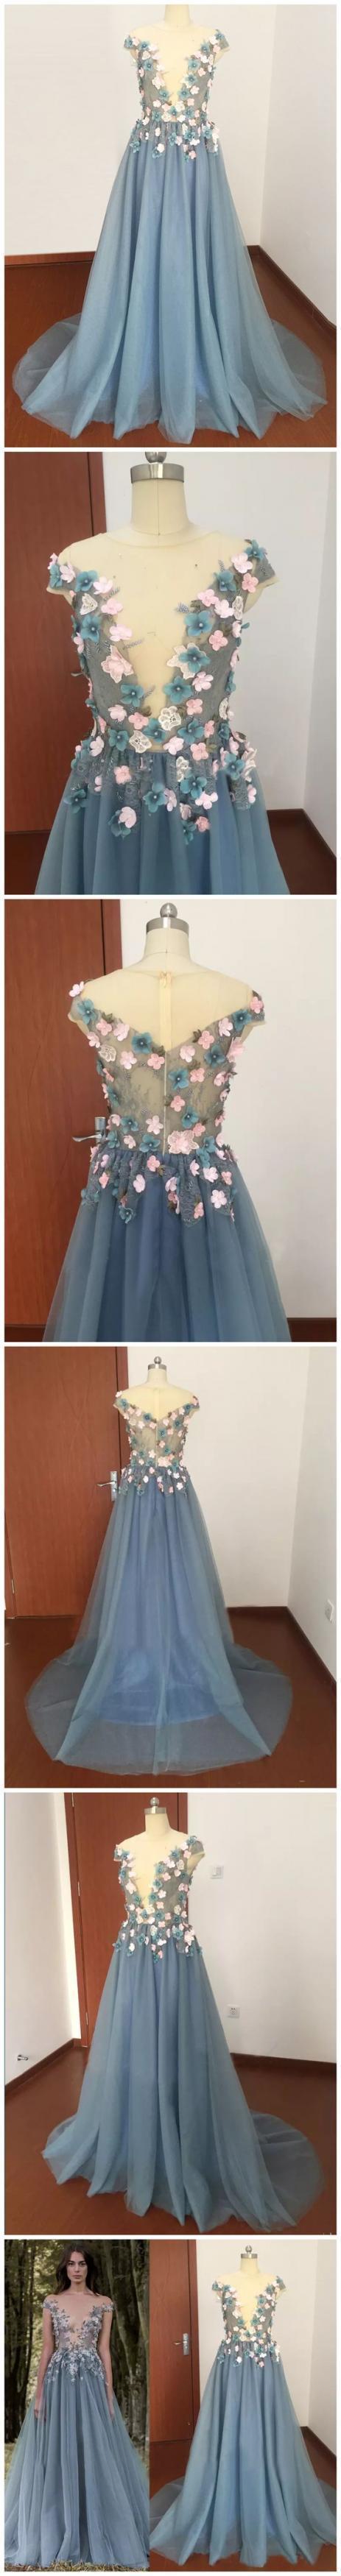 Appliques A-Line Prom Dress,Long Prom Dresses,Prom Dresses,Evening Dress,